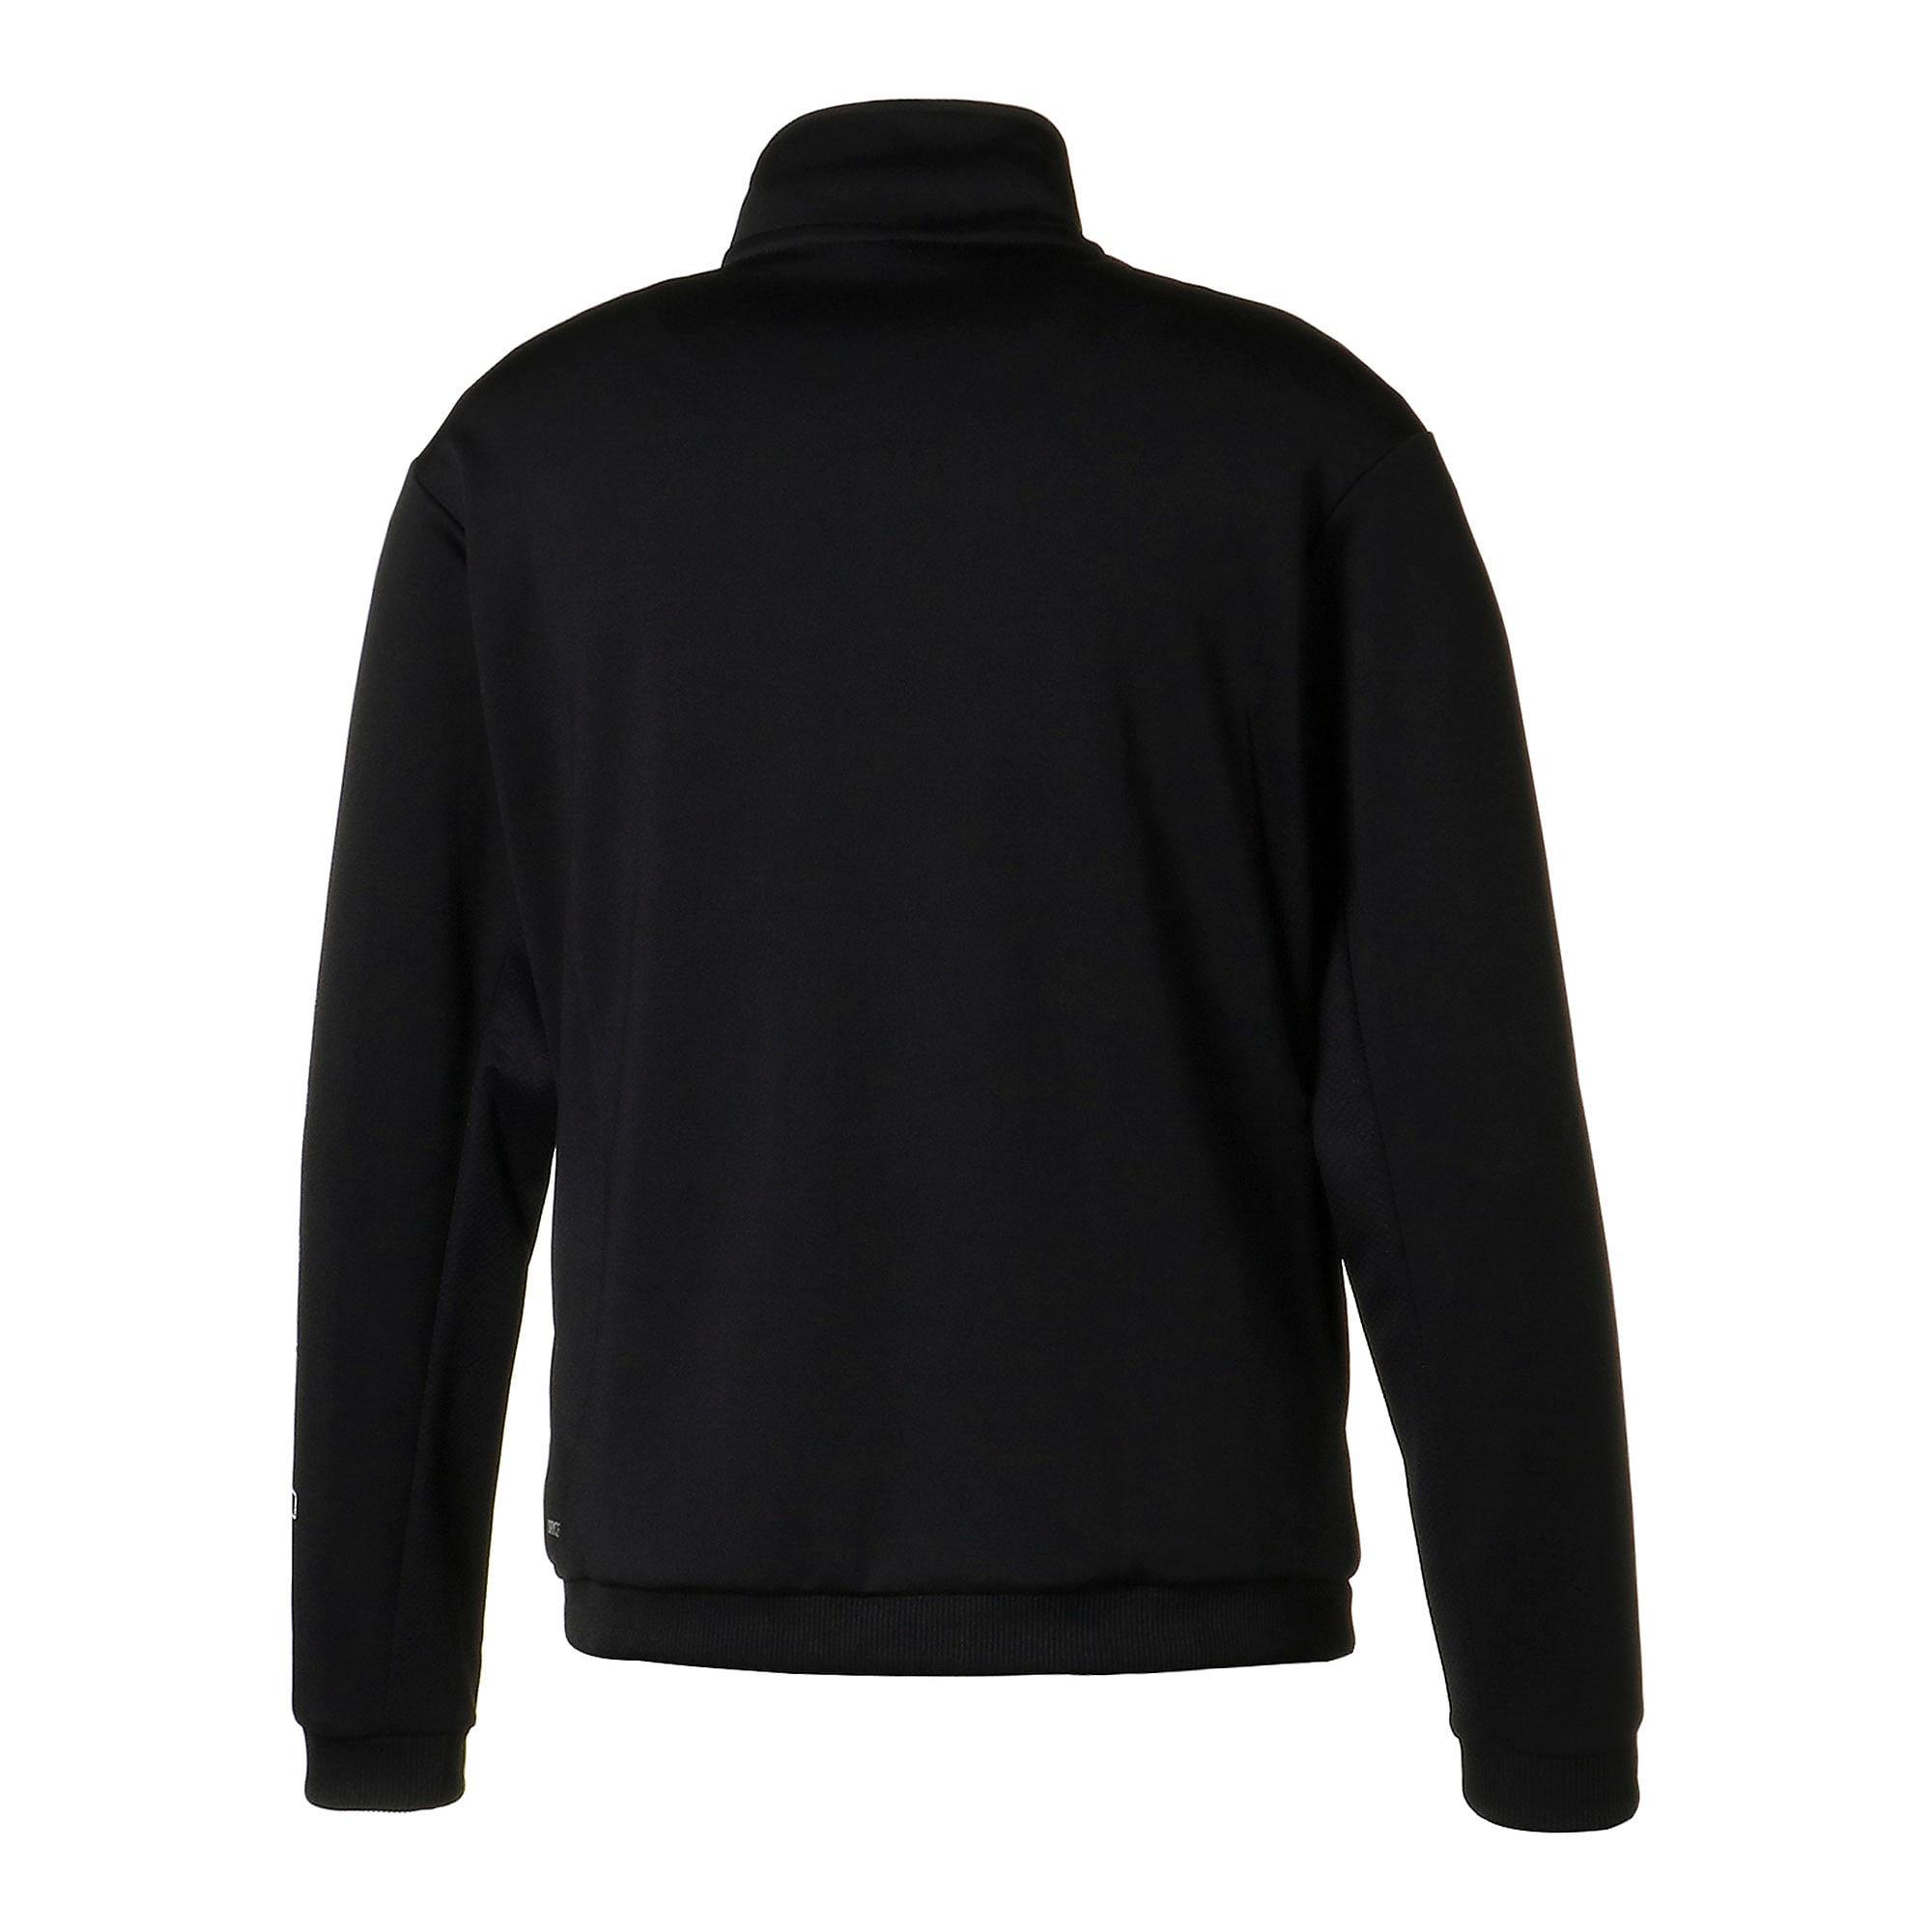 Thumbnail 3 of フィール イット ウィメンズ トレーニング ジャケット, Puma Black, medium-JPN